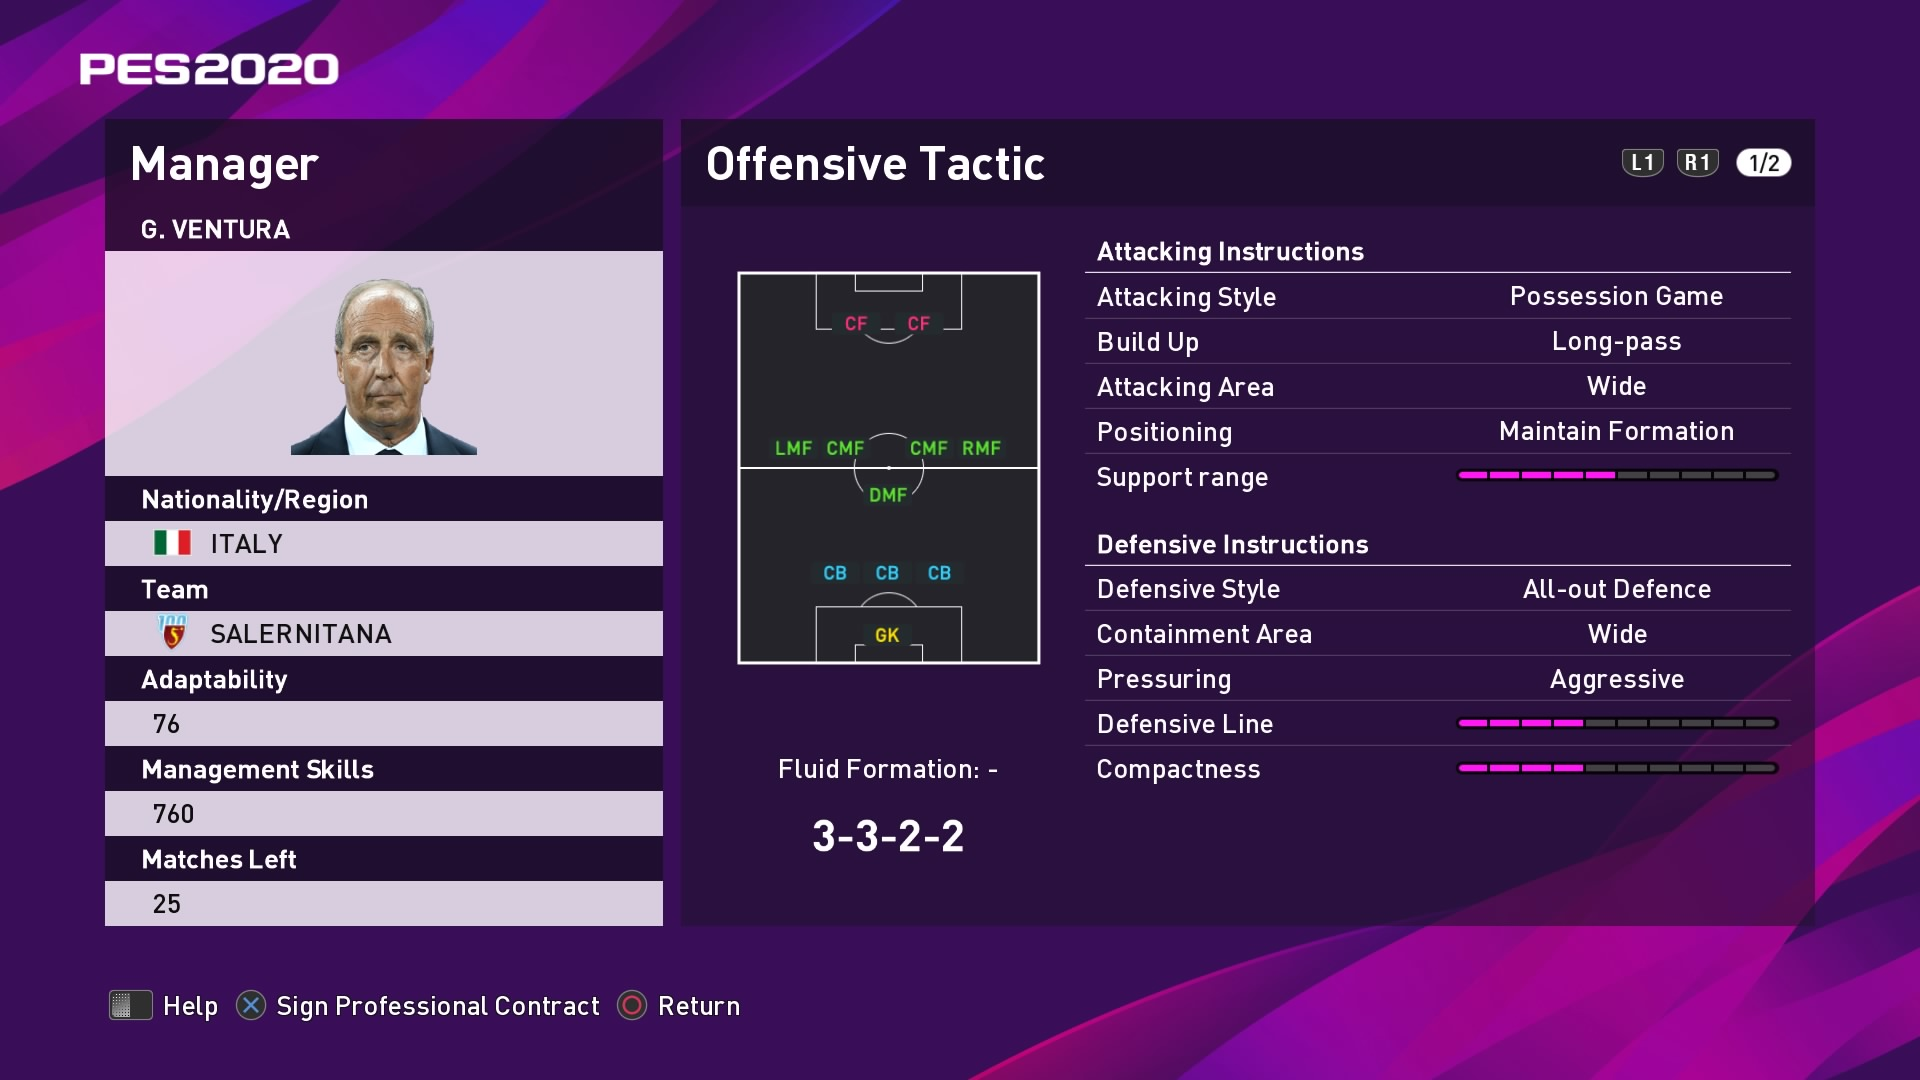 G. Ventura (Gian Piero Ventura) Offensive Tactic in PES 2020 myClub